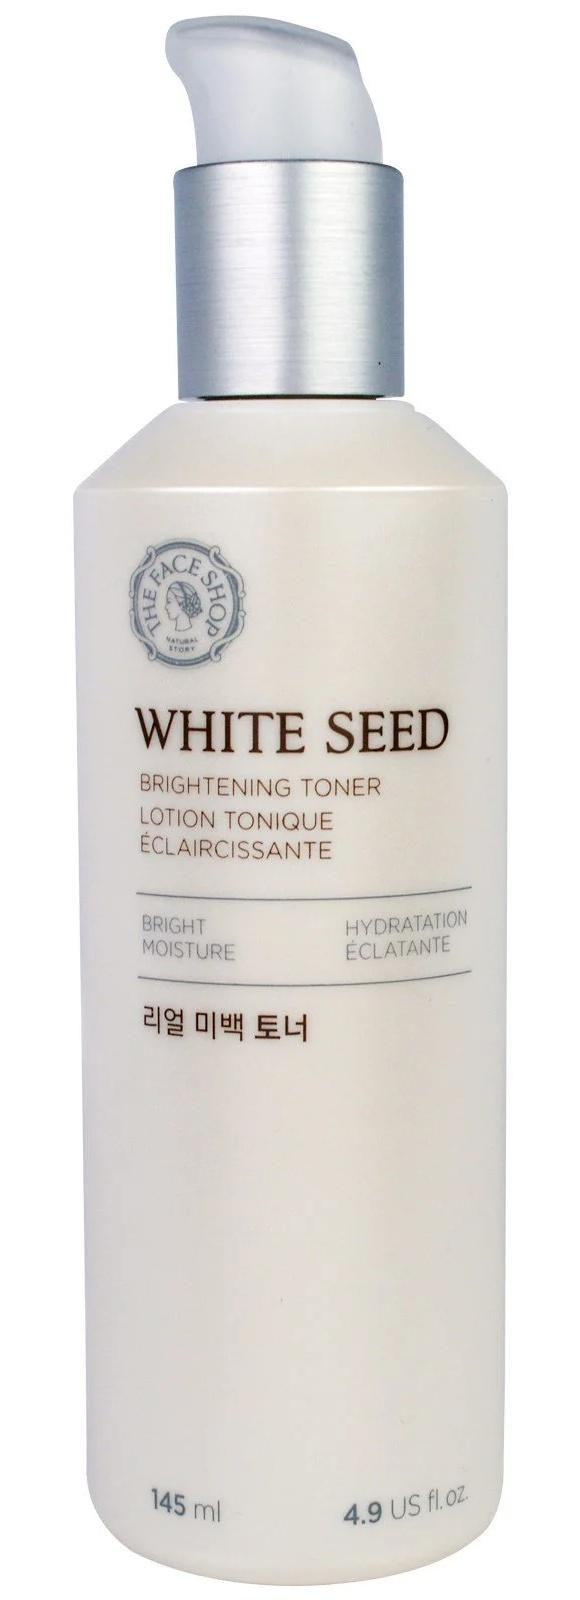 The Face Shop Dr. Belmeur White Seed Brightening Toner